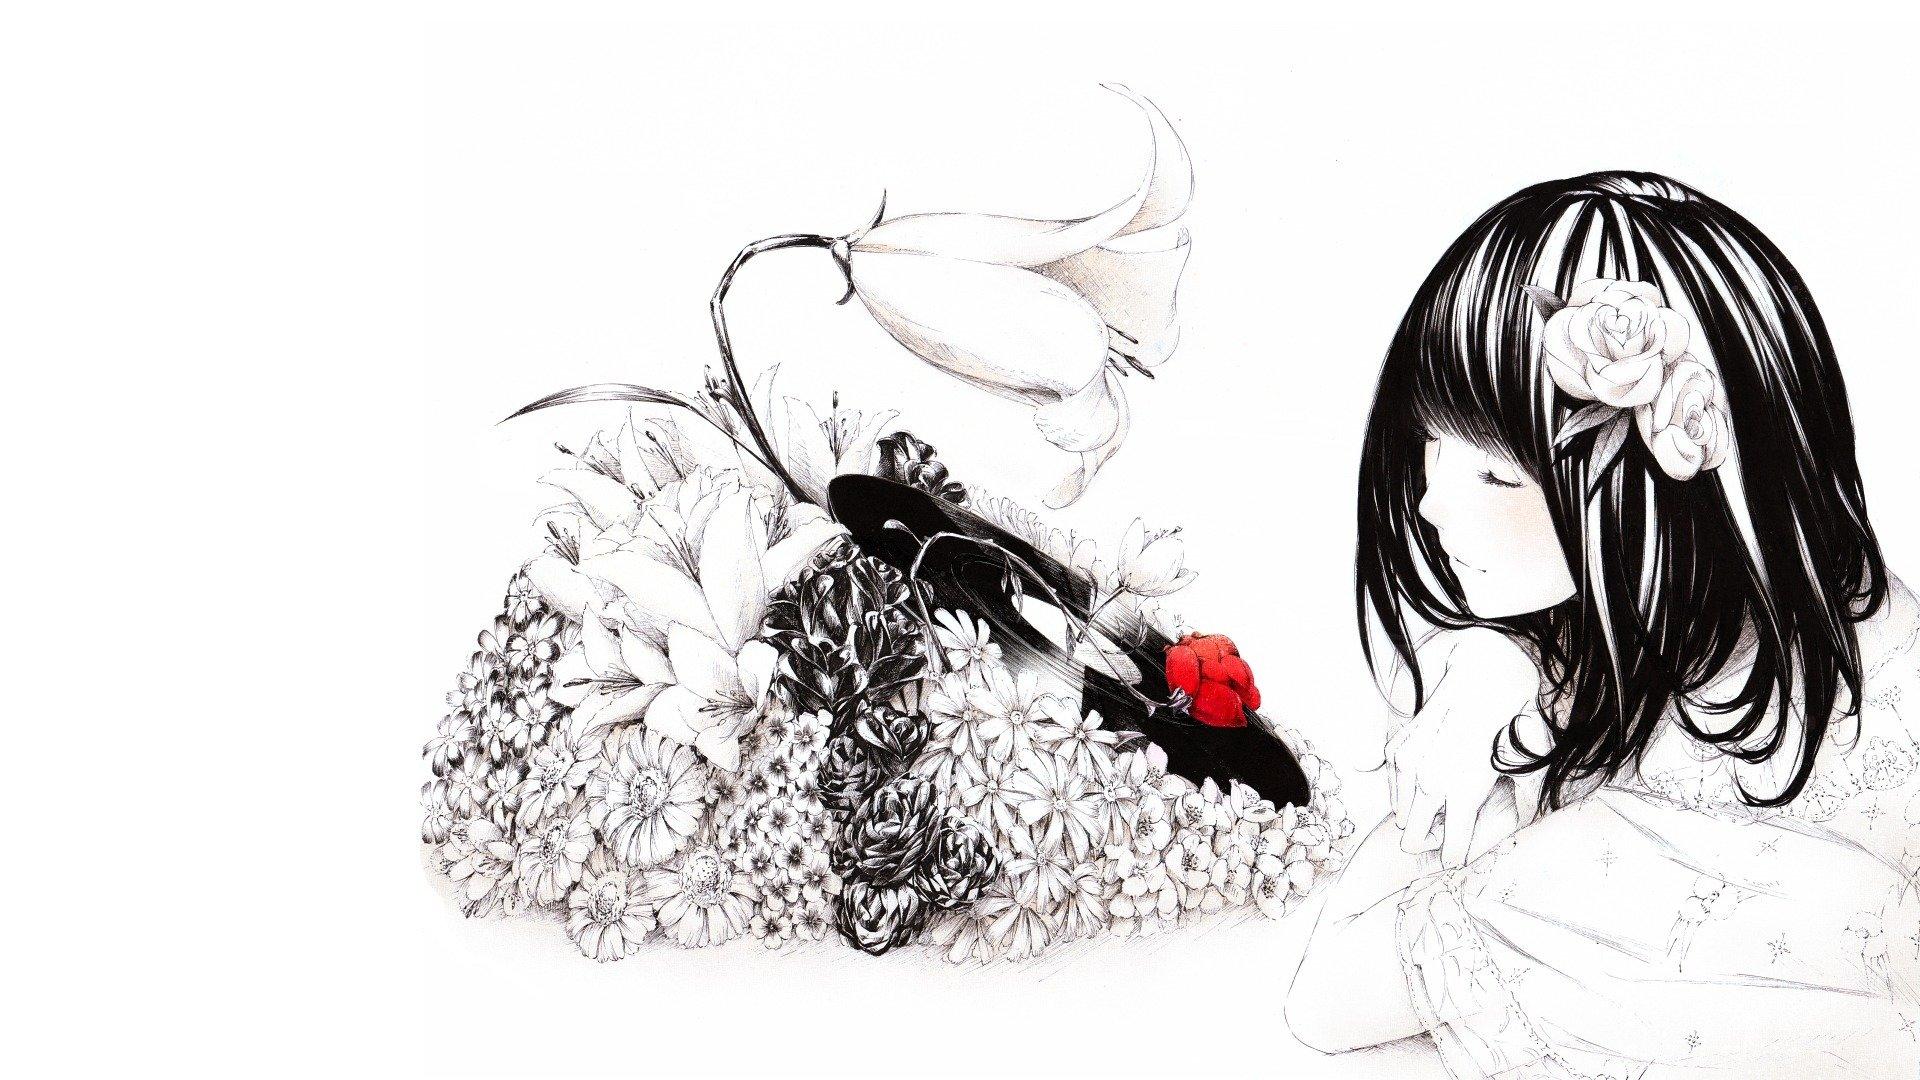 Cool Anime wallpapers 1920x1080 Full HD (1080p) desktop ...